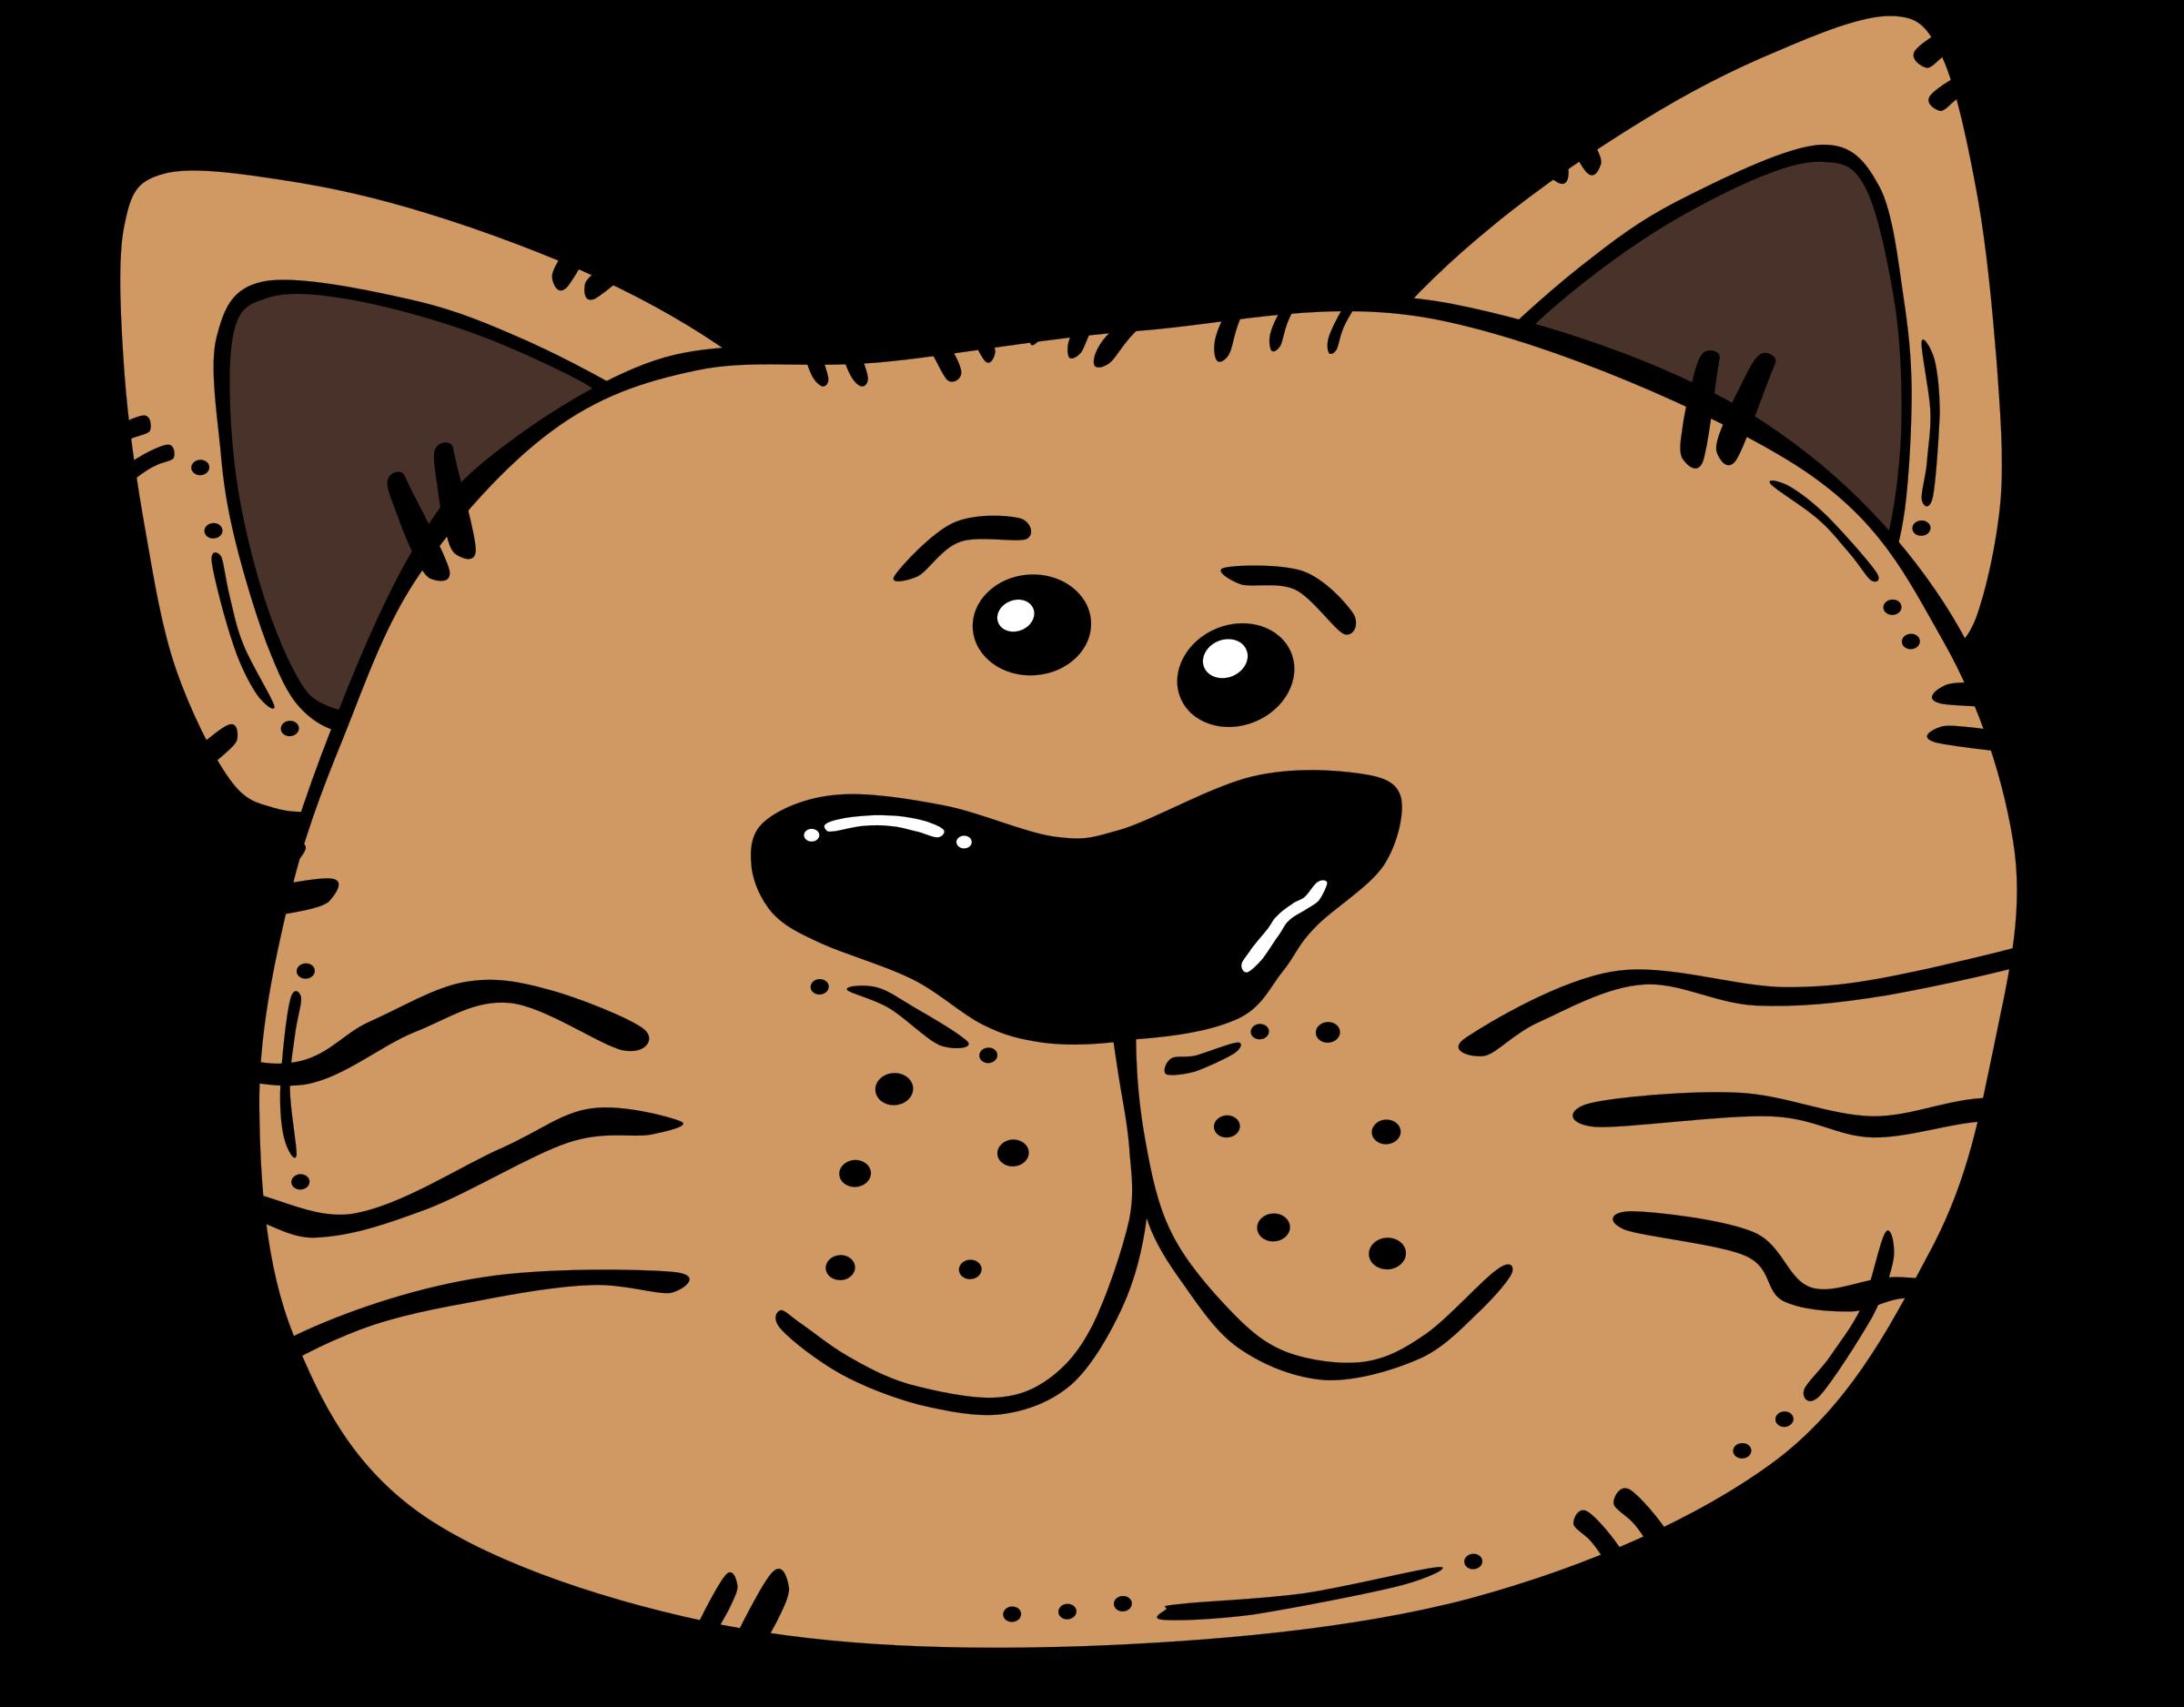 Orange cat face clipart jpg black and white library Clipart Cat Face - Free Clip Art - Clipart Bay jpg black and white library